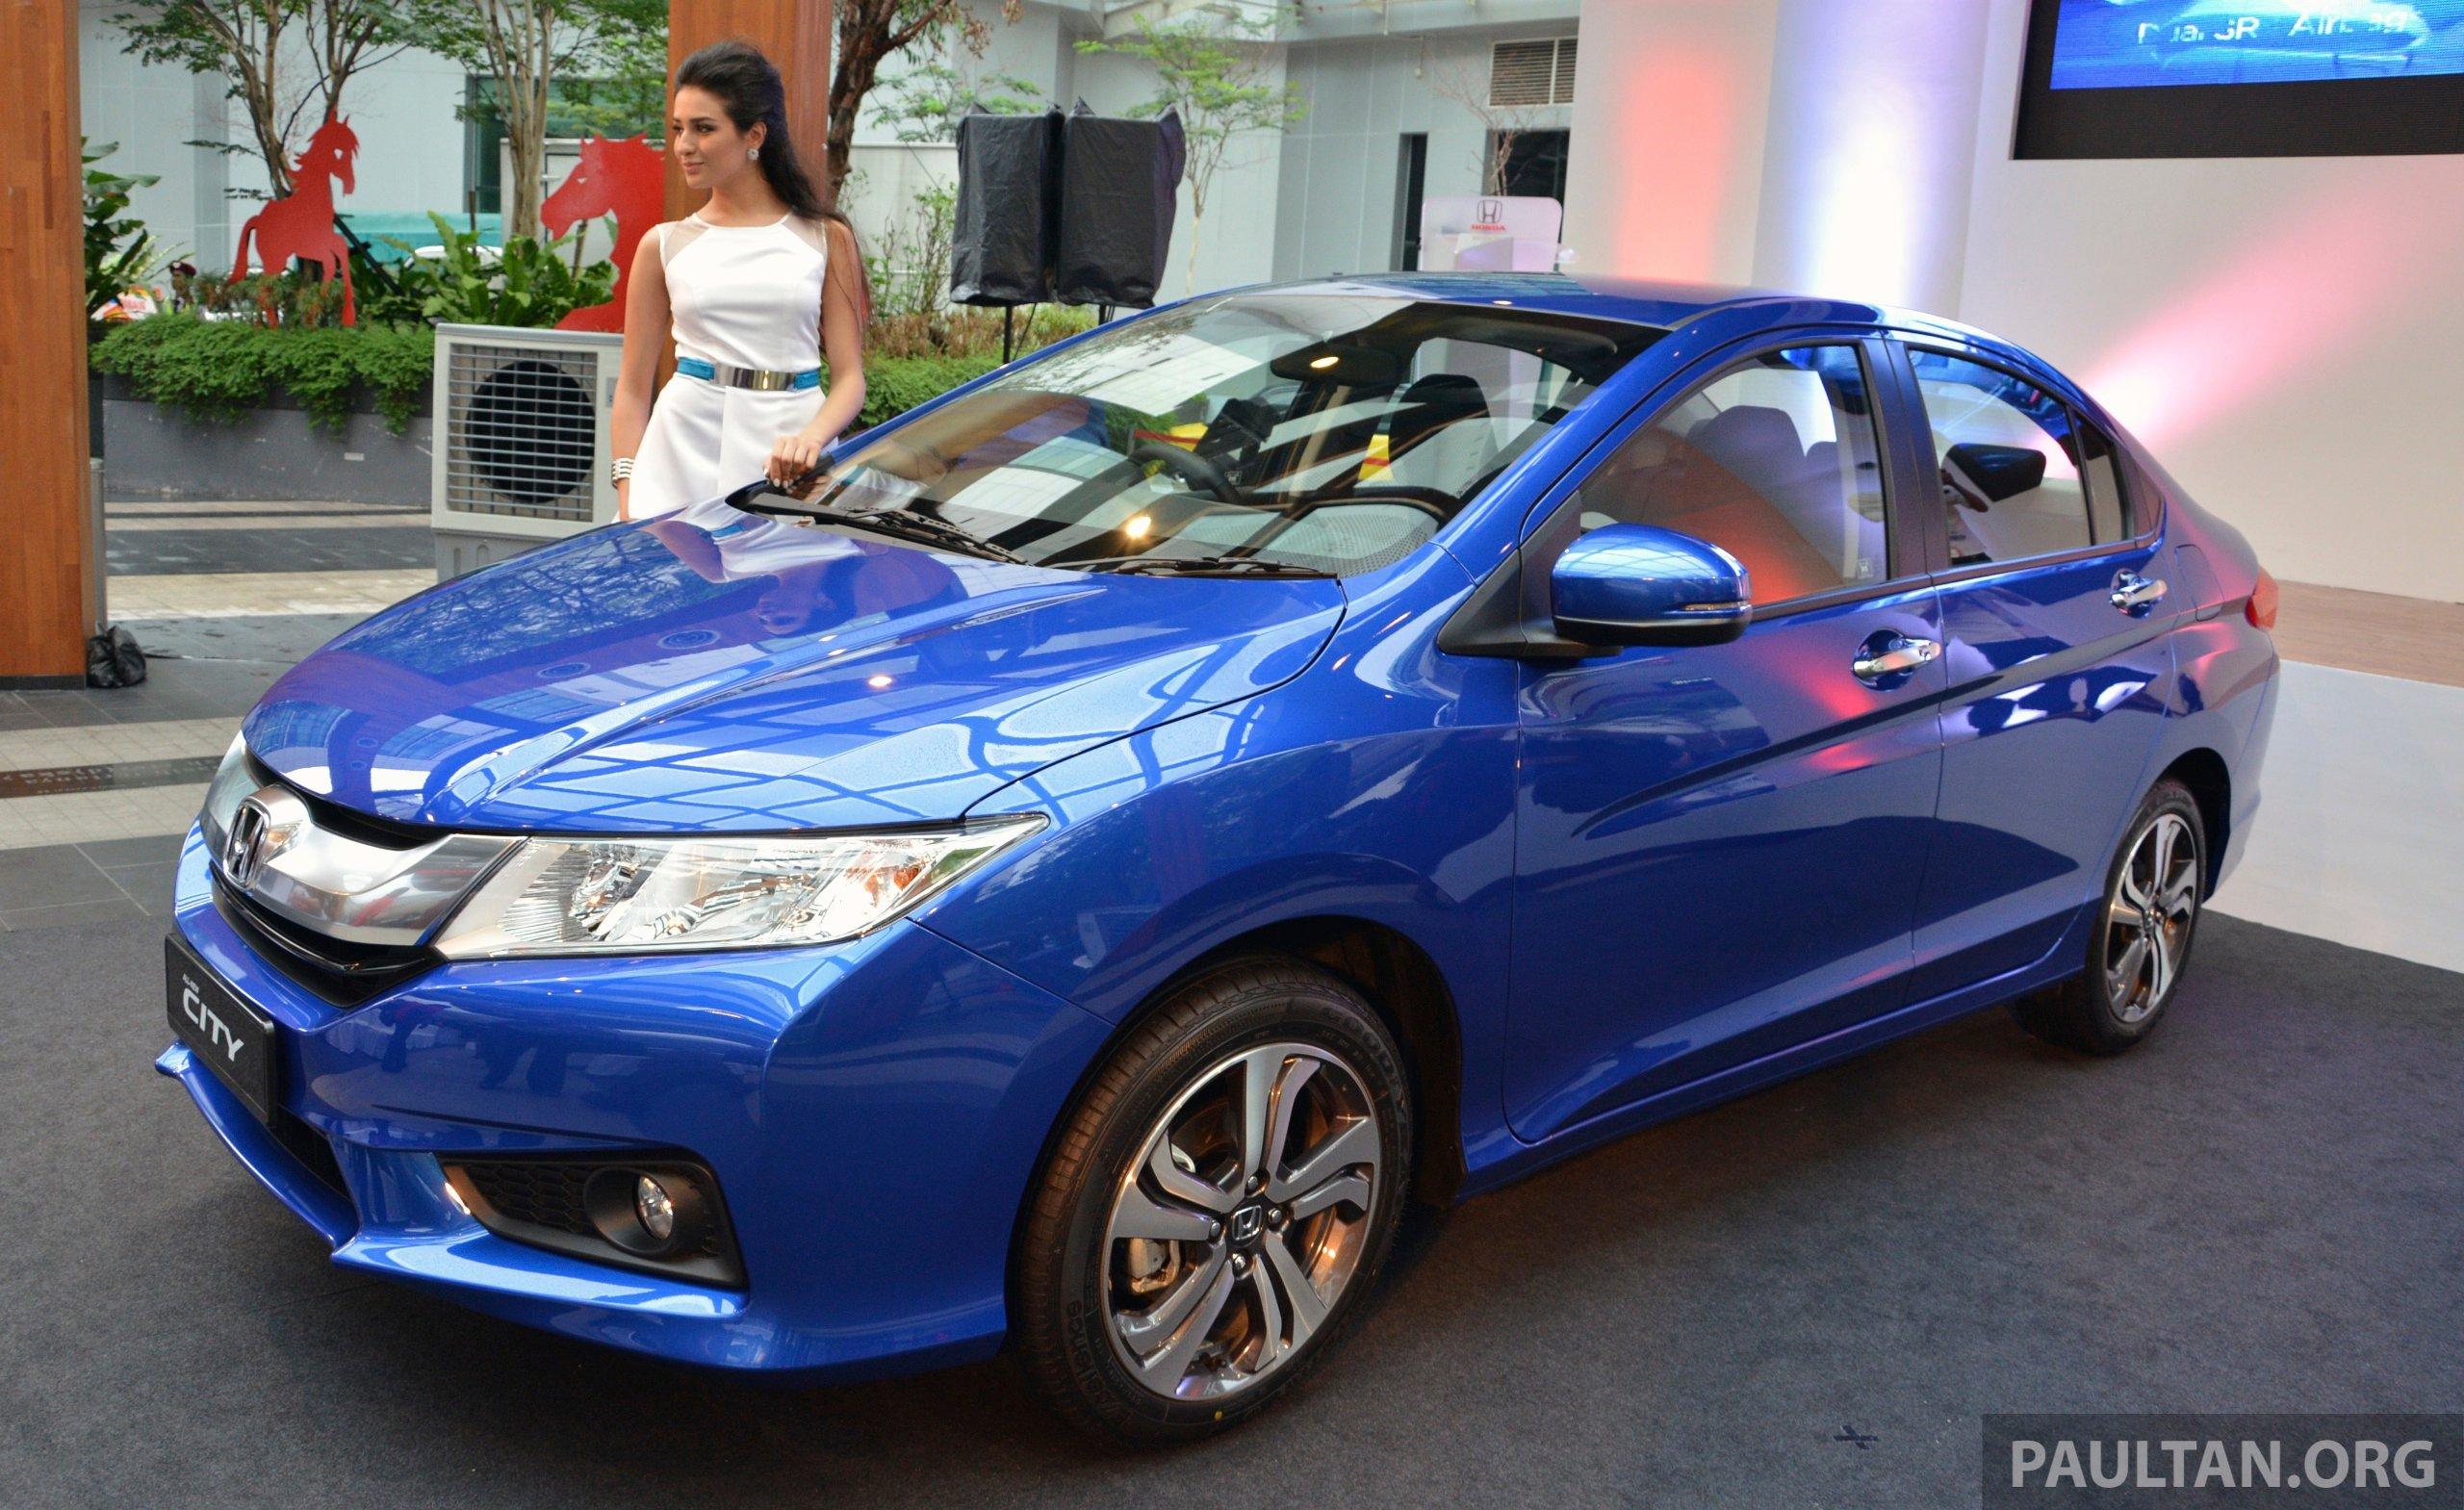 new car release in malaysia 2014Honda Jazz 2014 Malaysia Colour  CFA Vauban du Btiment